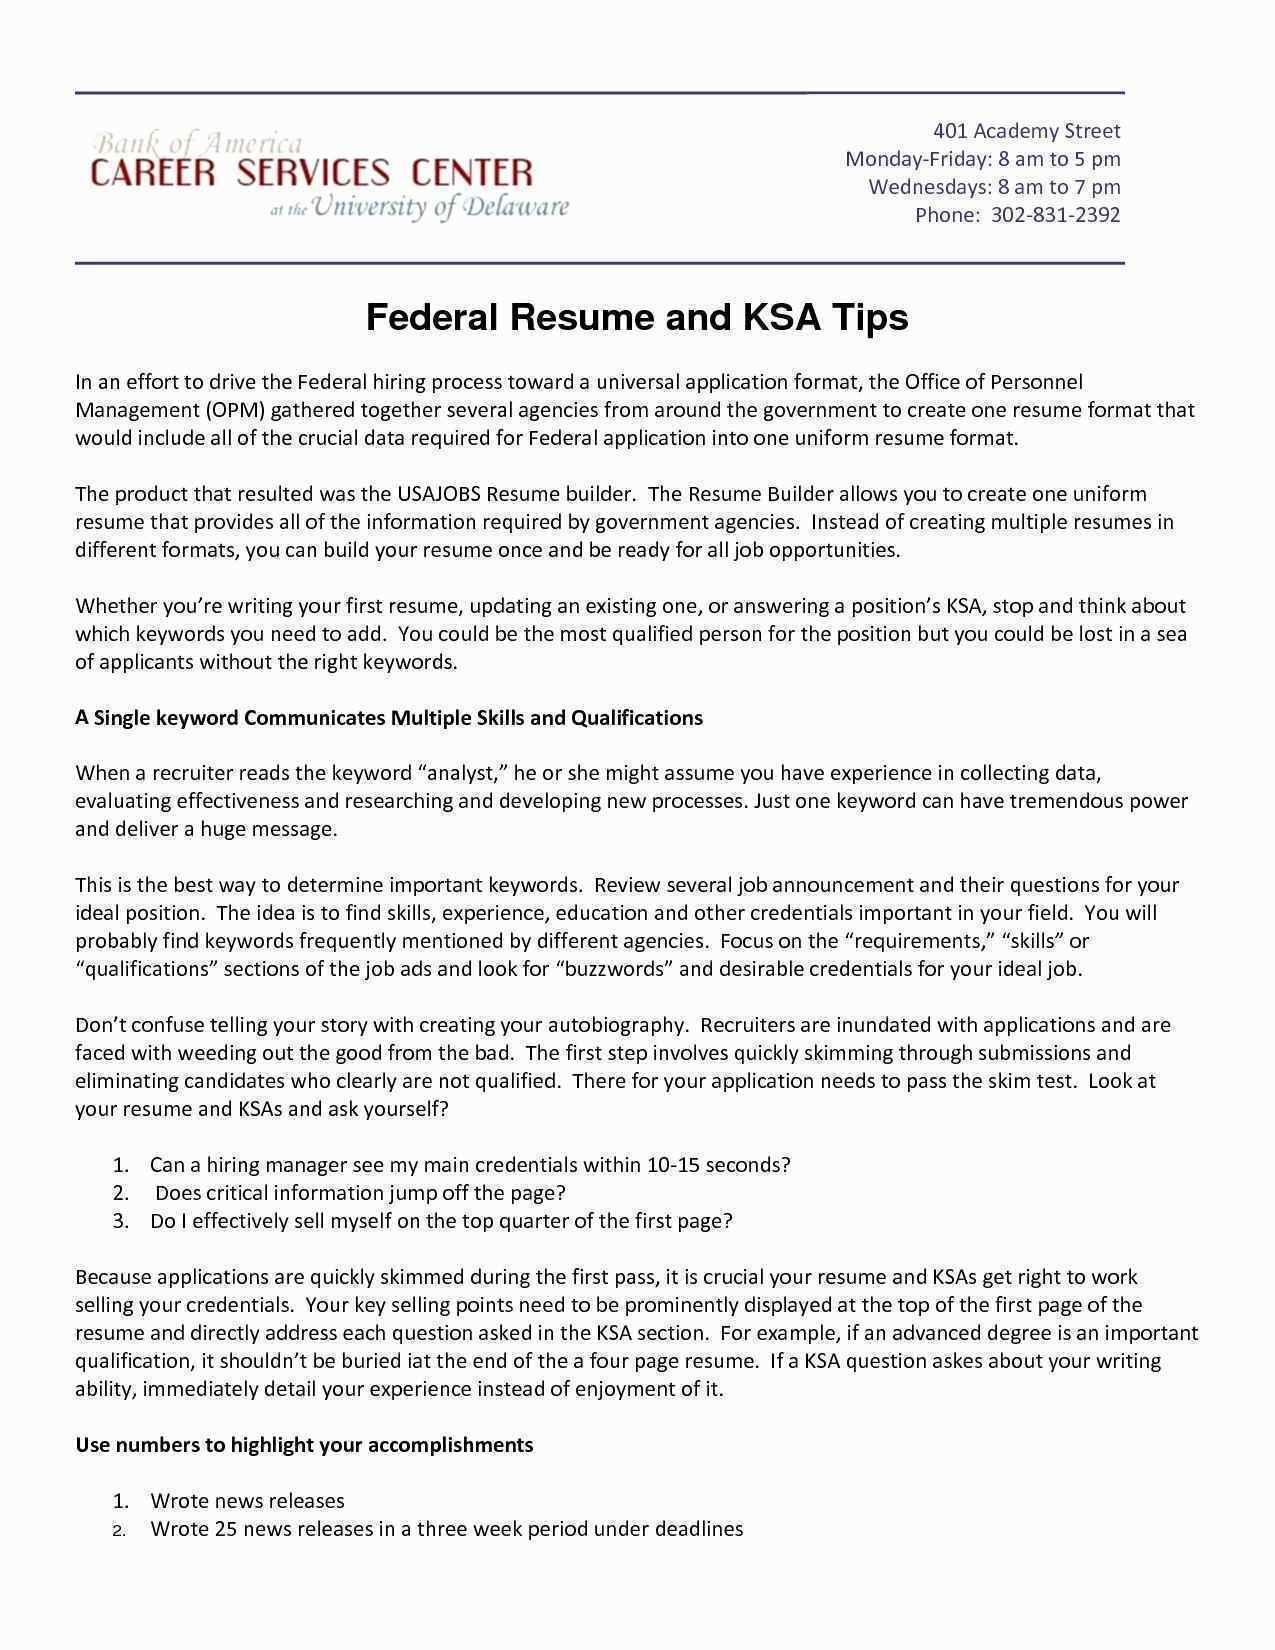 Social Story Template Unique Unique Sample Federal Resume